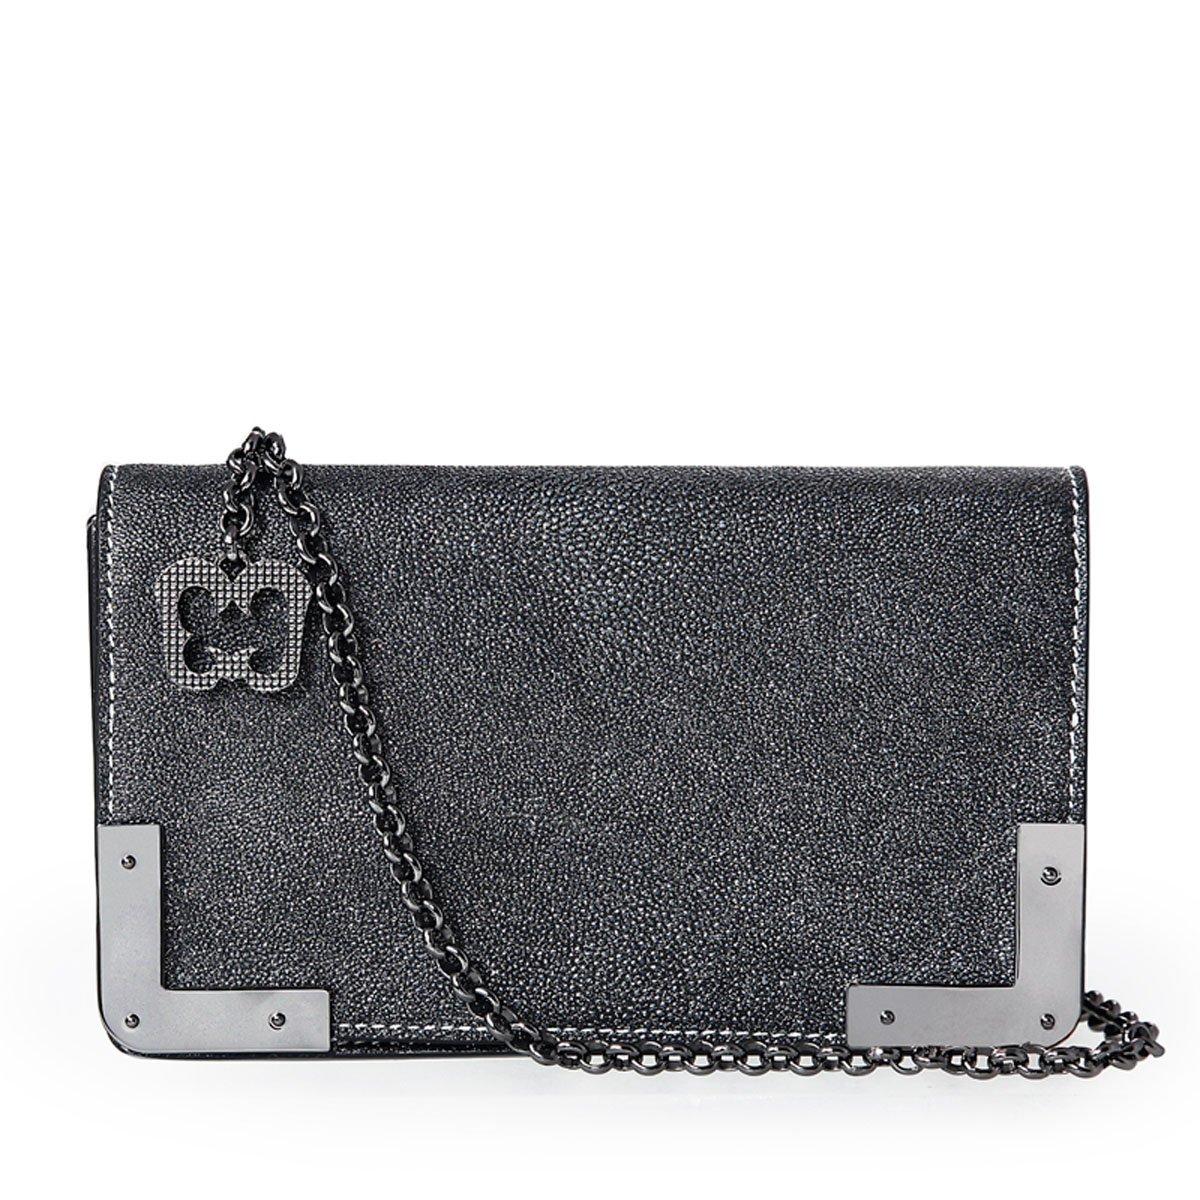 Eric Javits Luxury Fashion Designer Women's Handbag - Cassidy - Gun Glitter